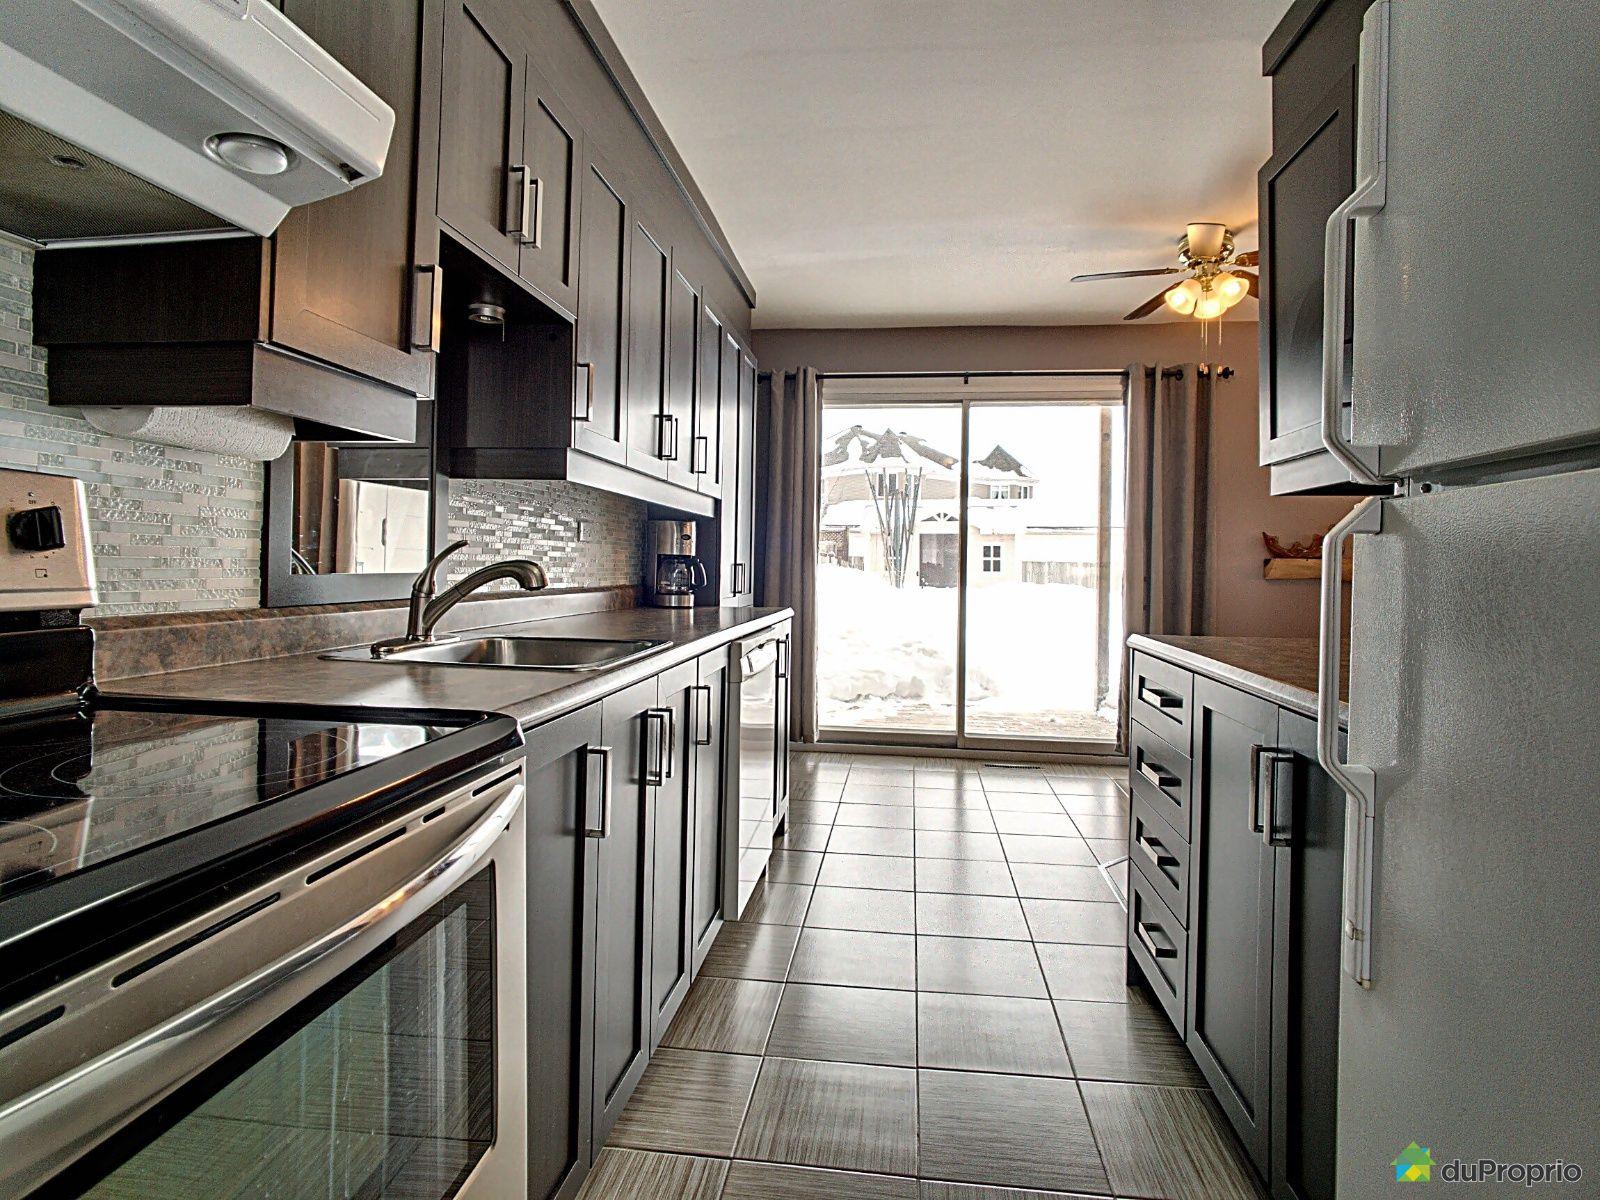 Kitchen - 2695 rue Rageot, Duberger for sale